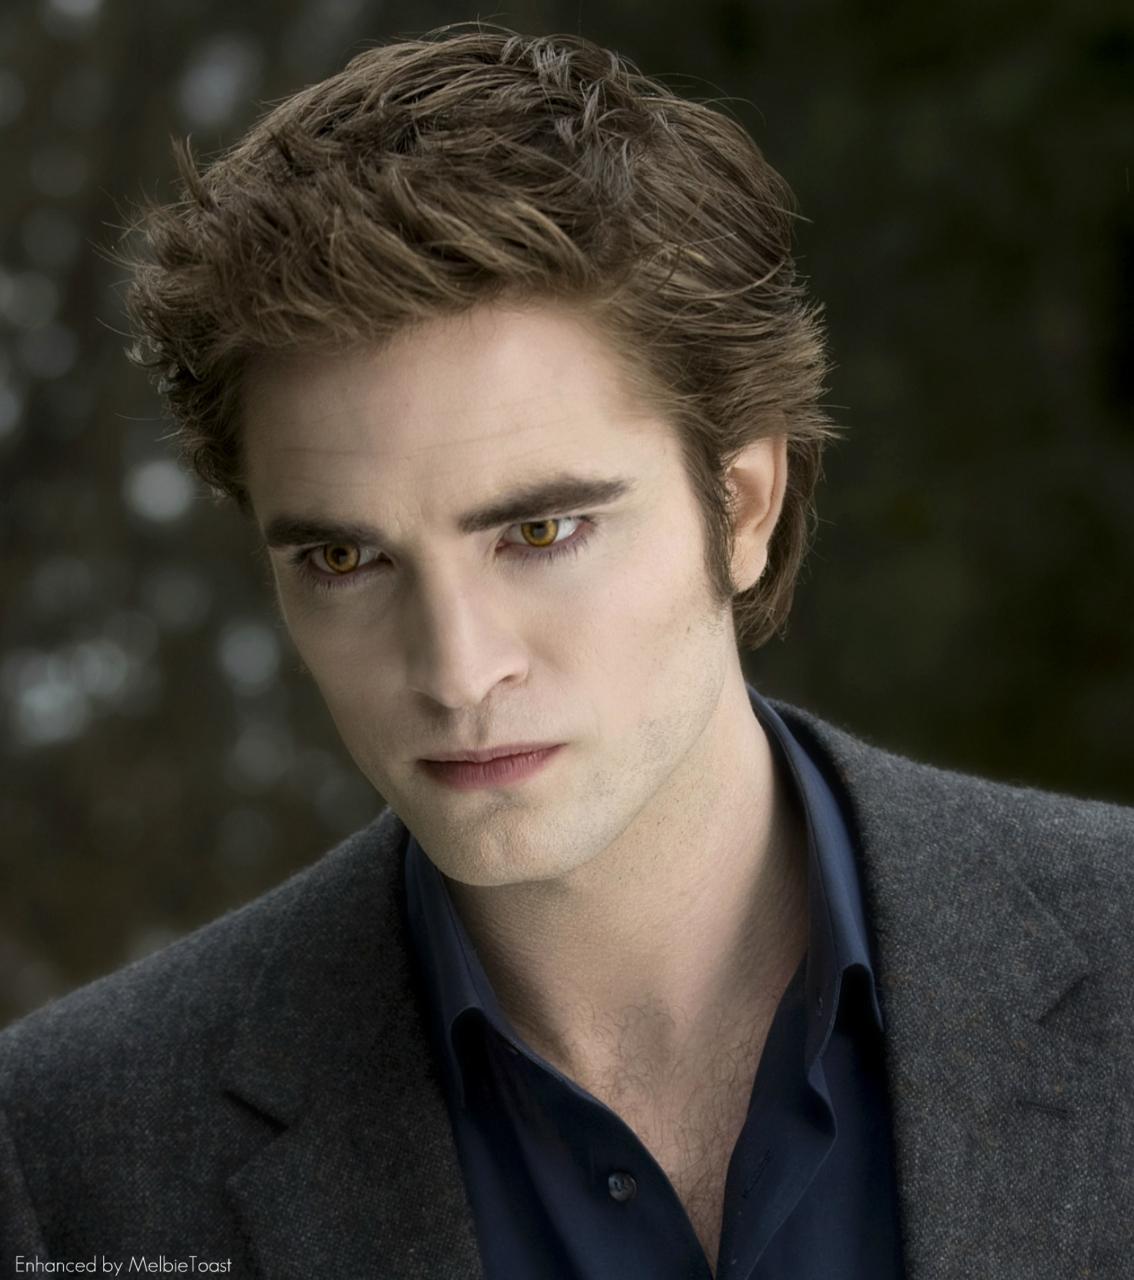 Robert Pattinson: Kaleidoscope Eyes